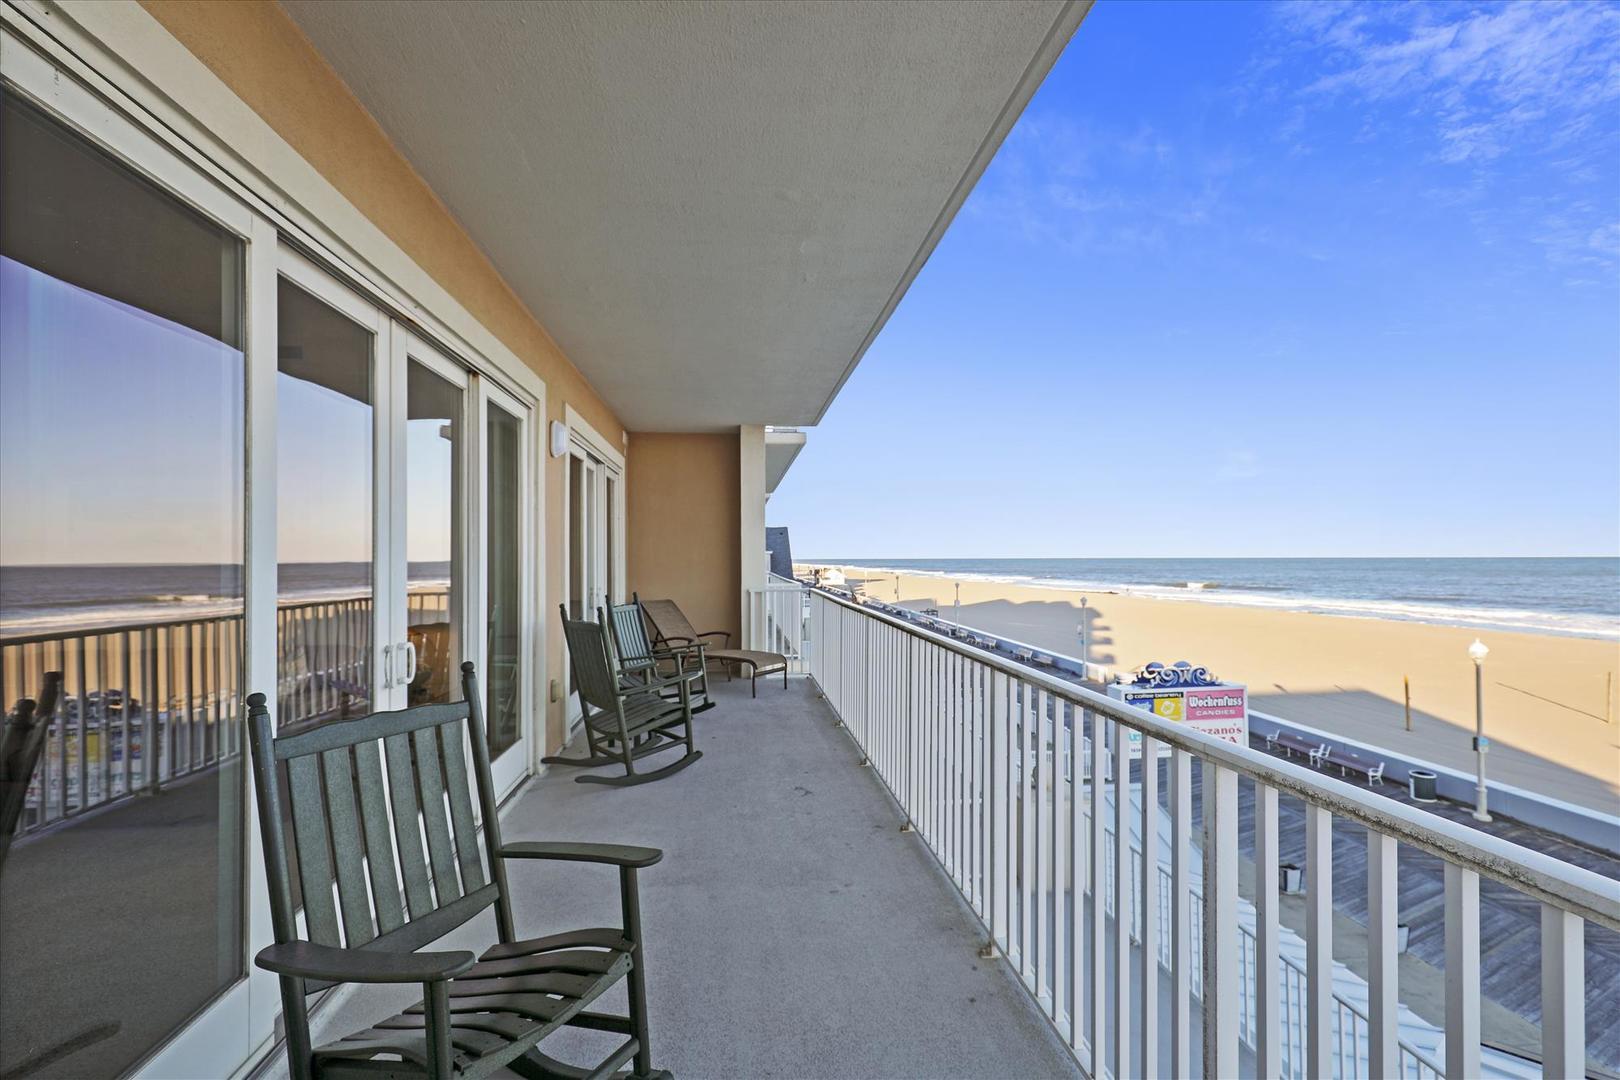 South Beach 304 - Balcony on Boardwalk